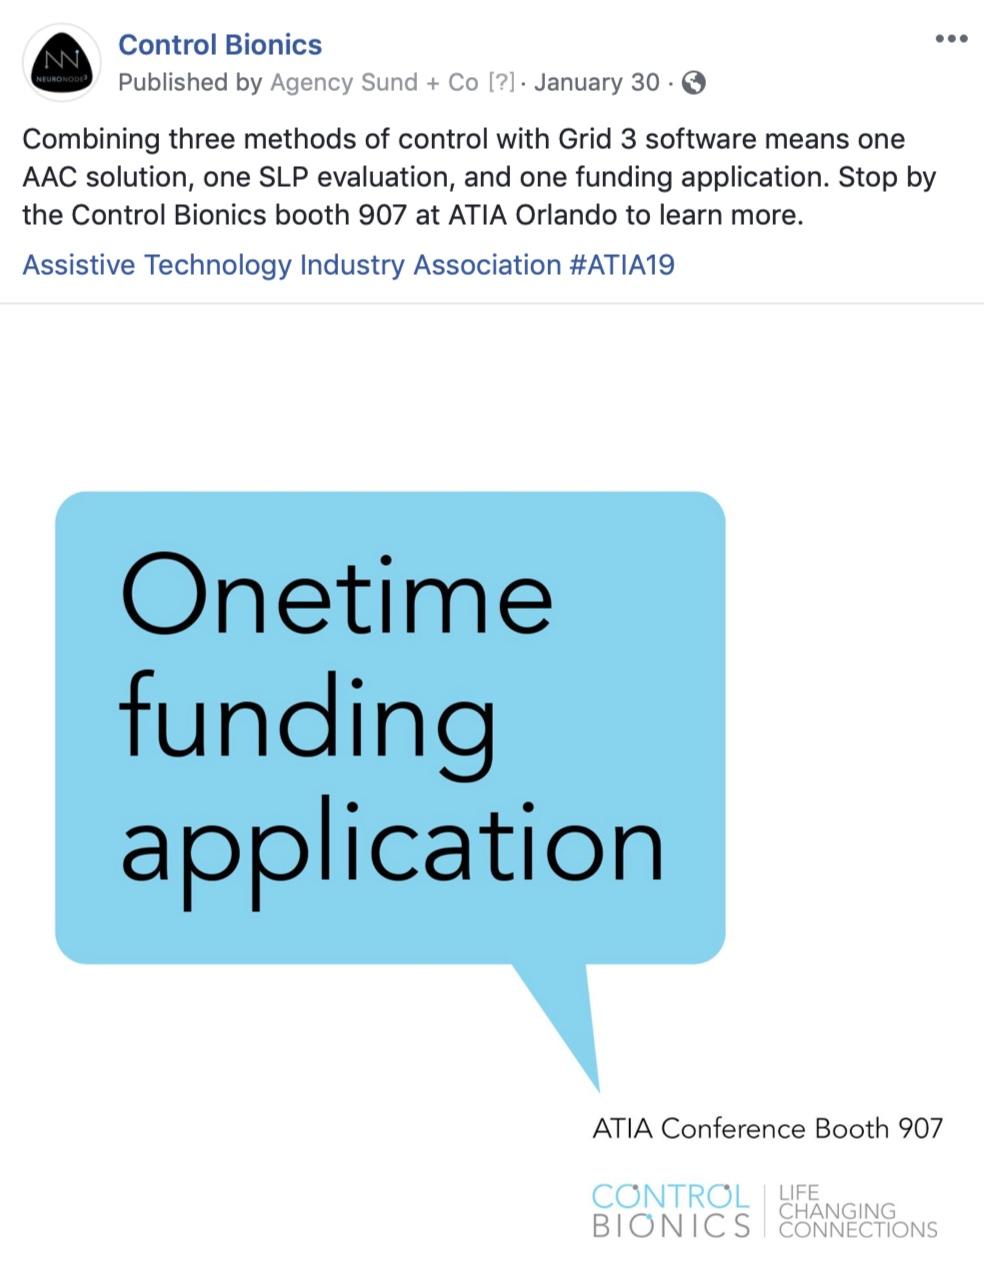 19 01 30 ATIA Onetime Funding.jpg